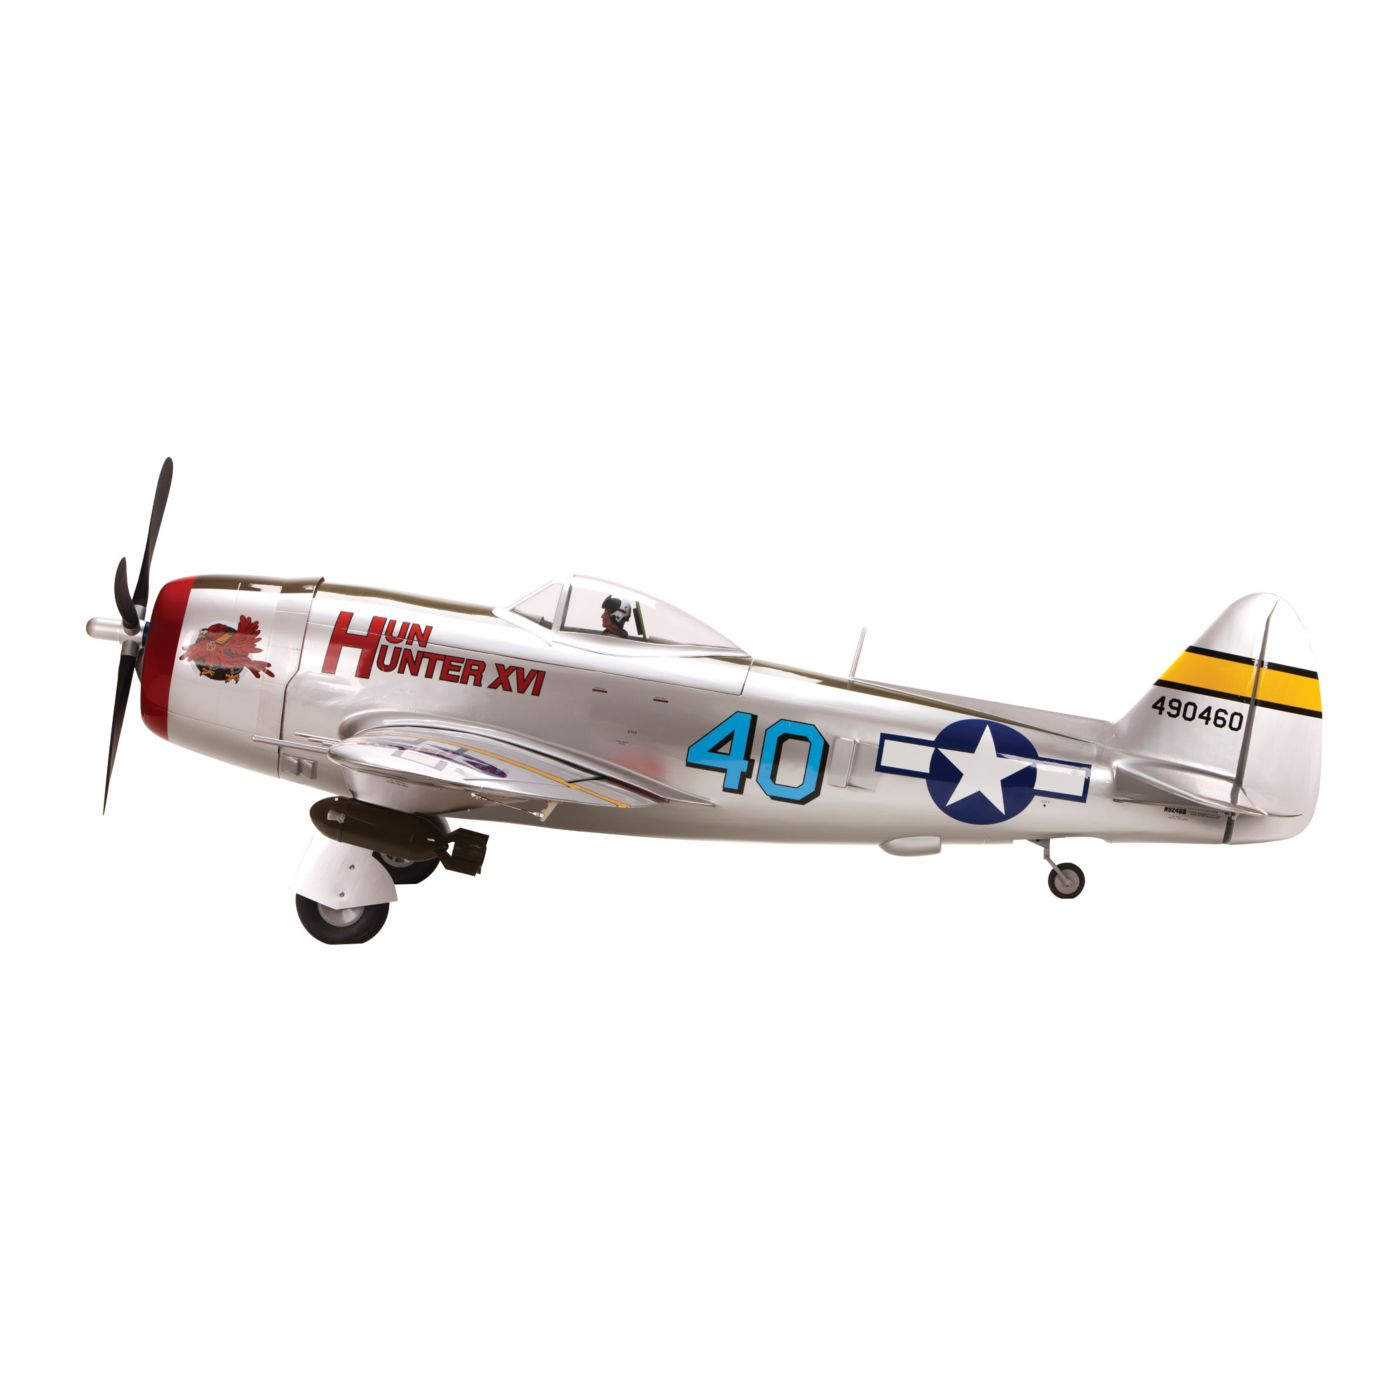 P-47D-40 Thunderbolt hangar 9